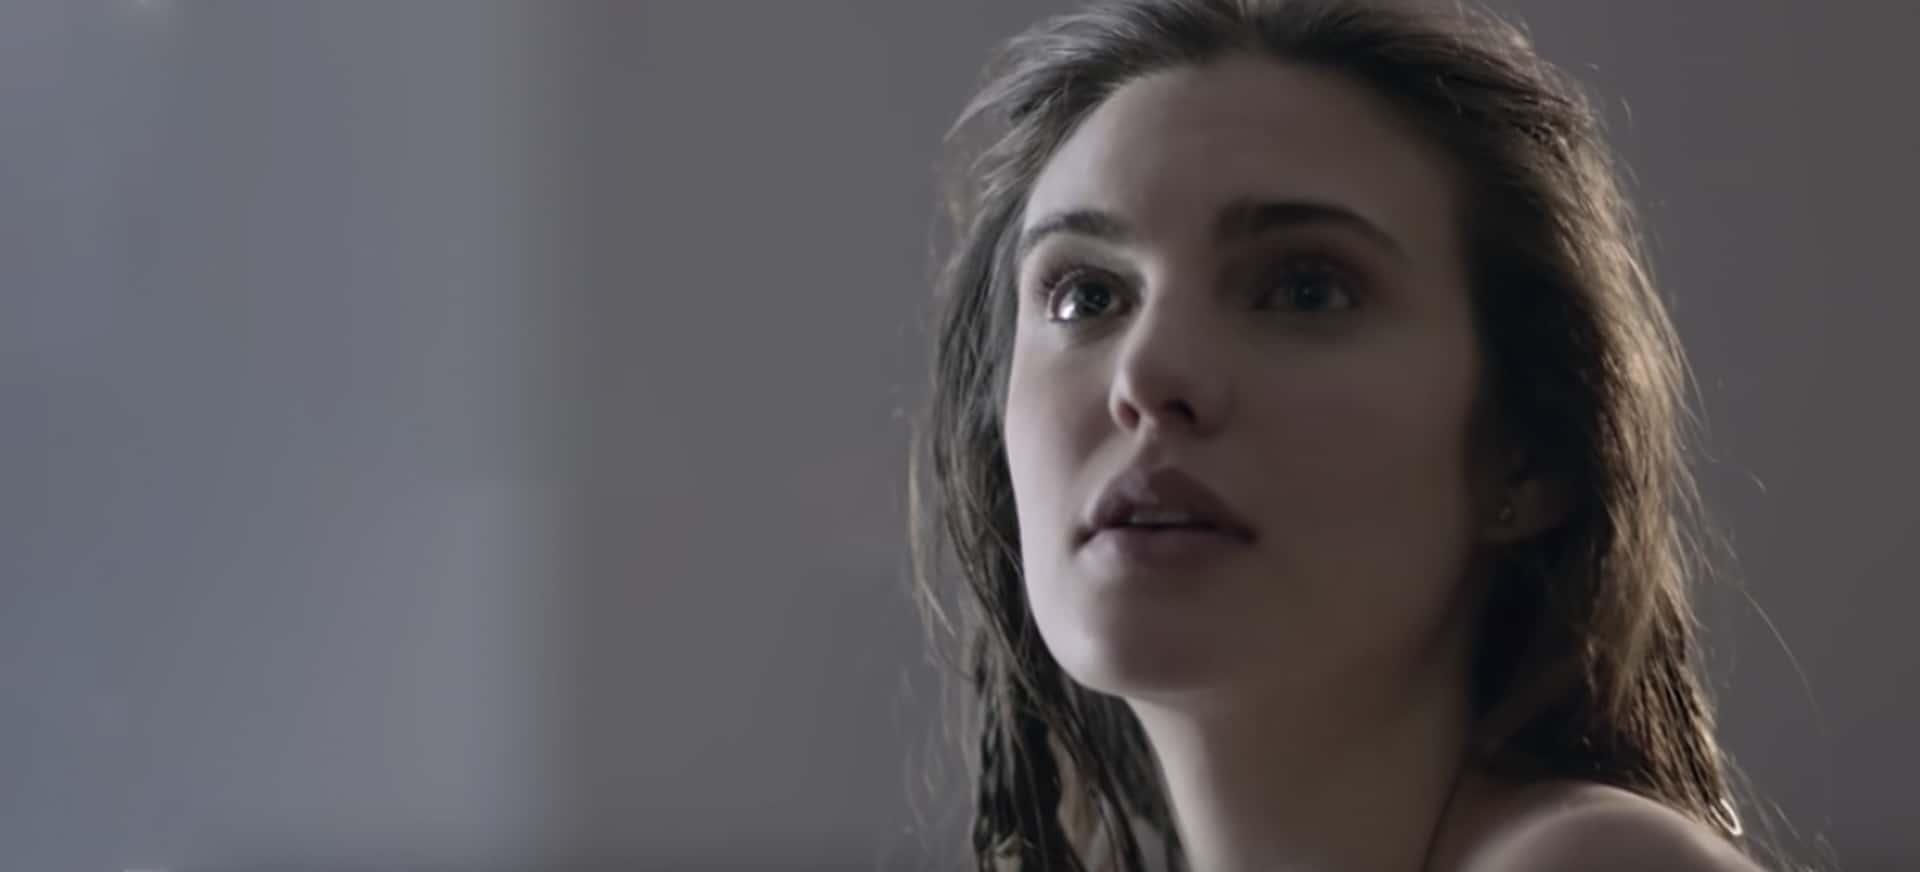 Macarena Achaga: del fenómeno Juliantina al cine